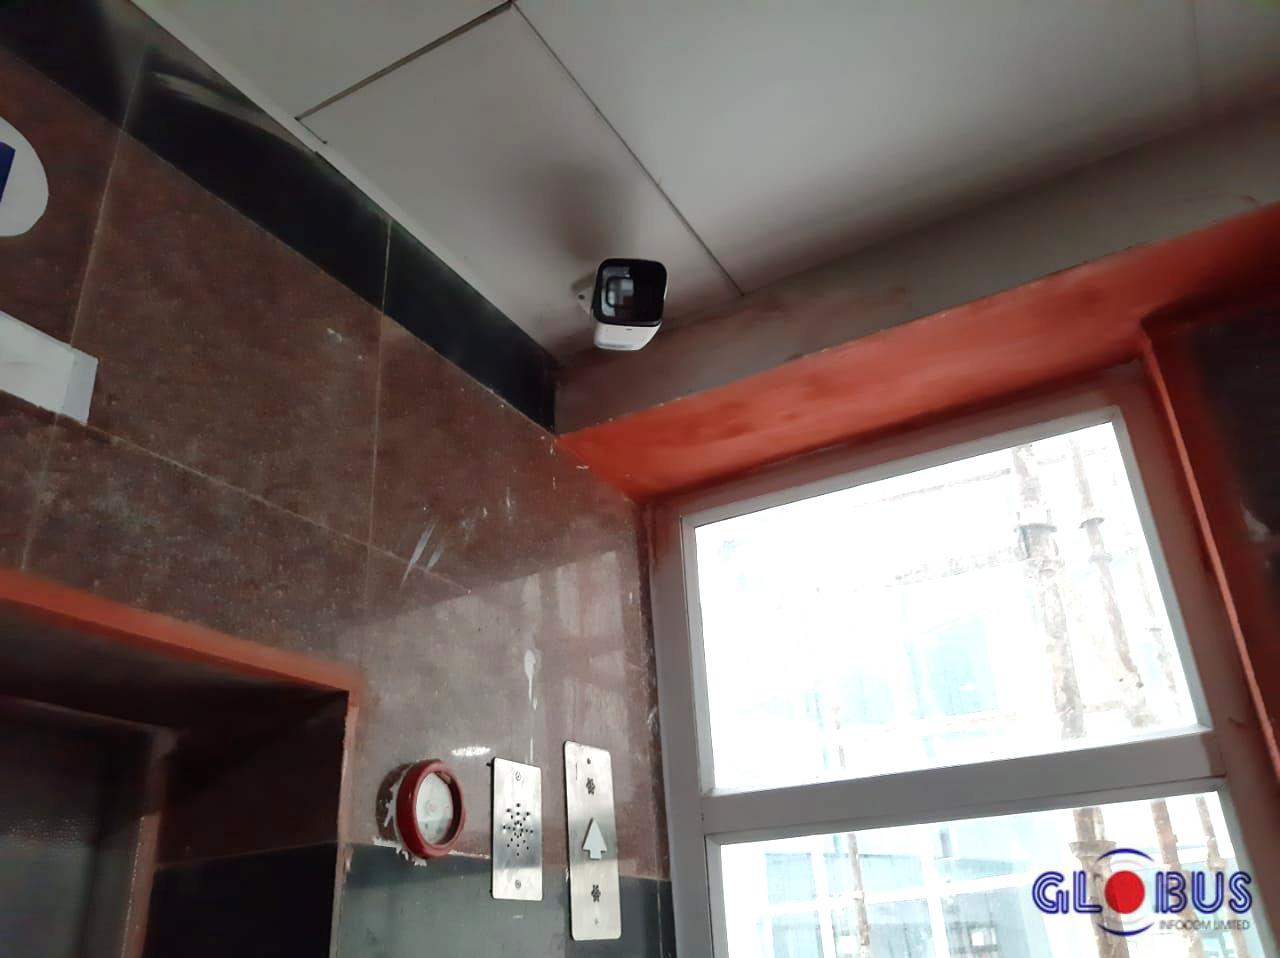 Globus Bullet CCTV Camera